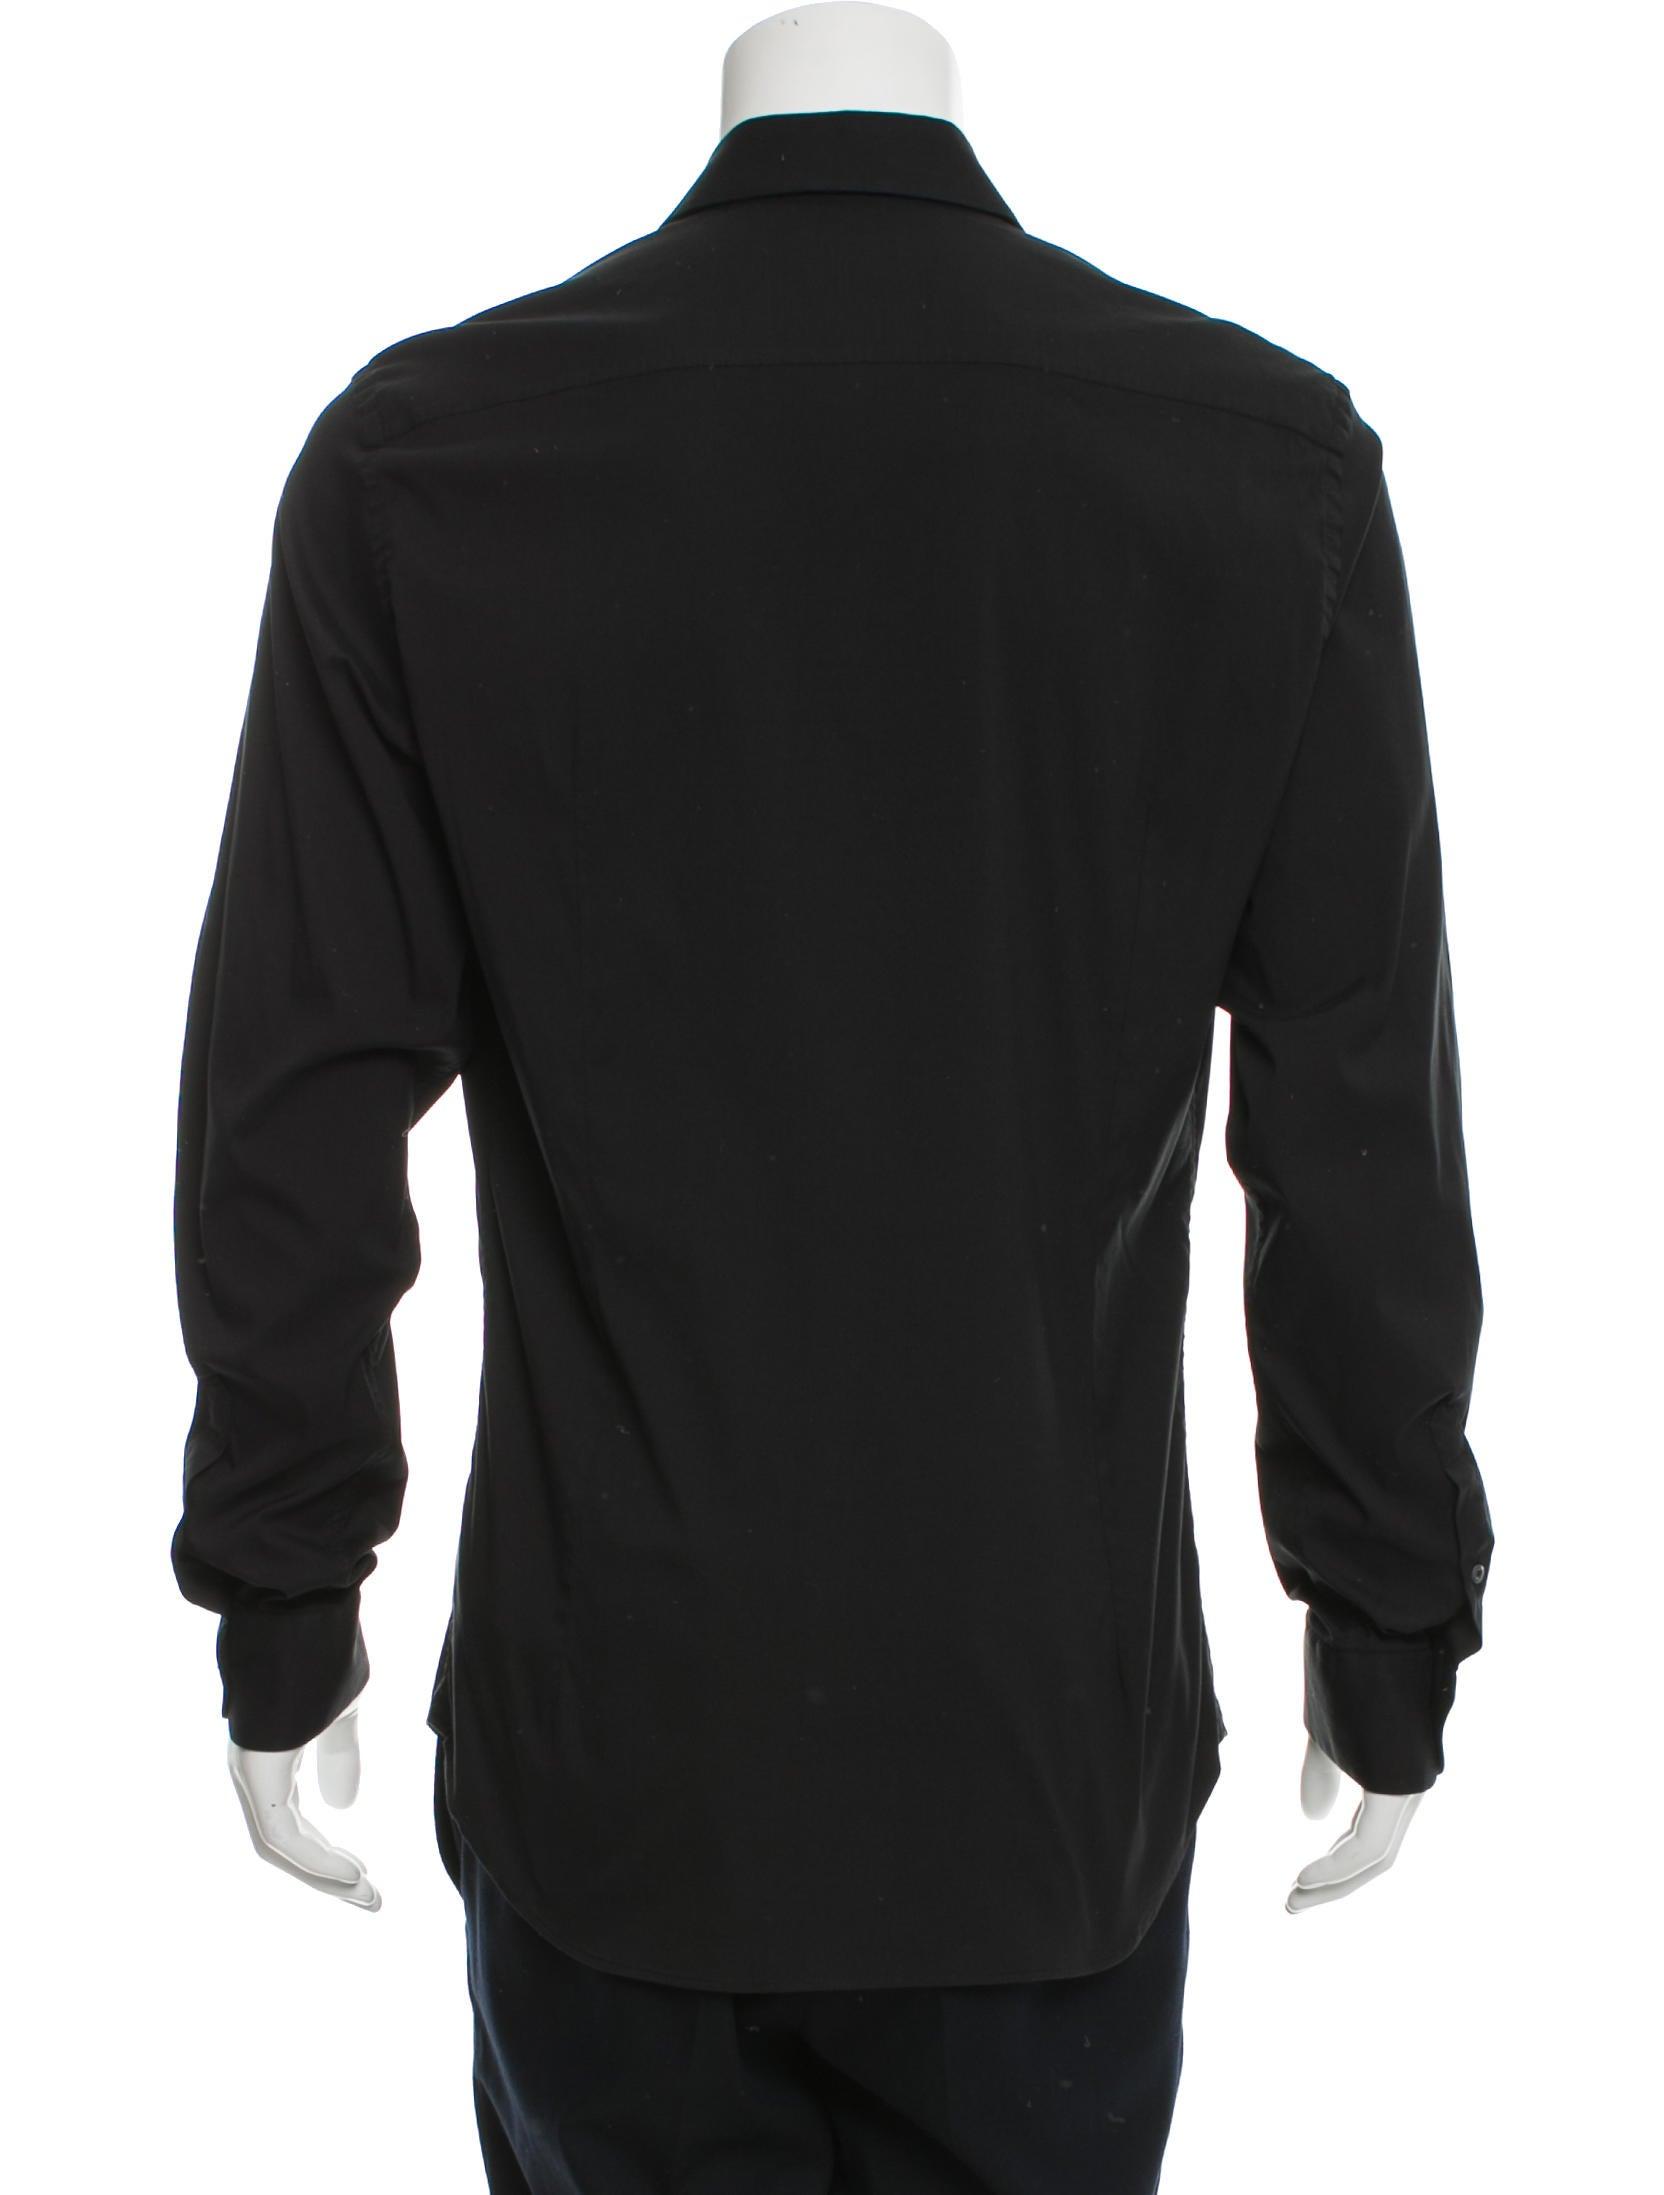 Prada Long Sleeve Button Up Shirt Clothing Pra147900